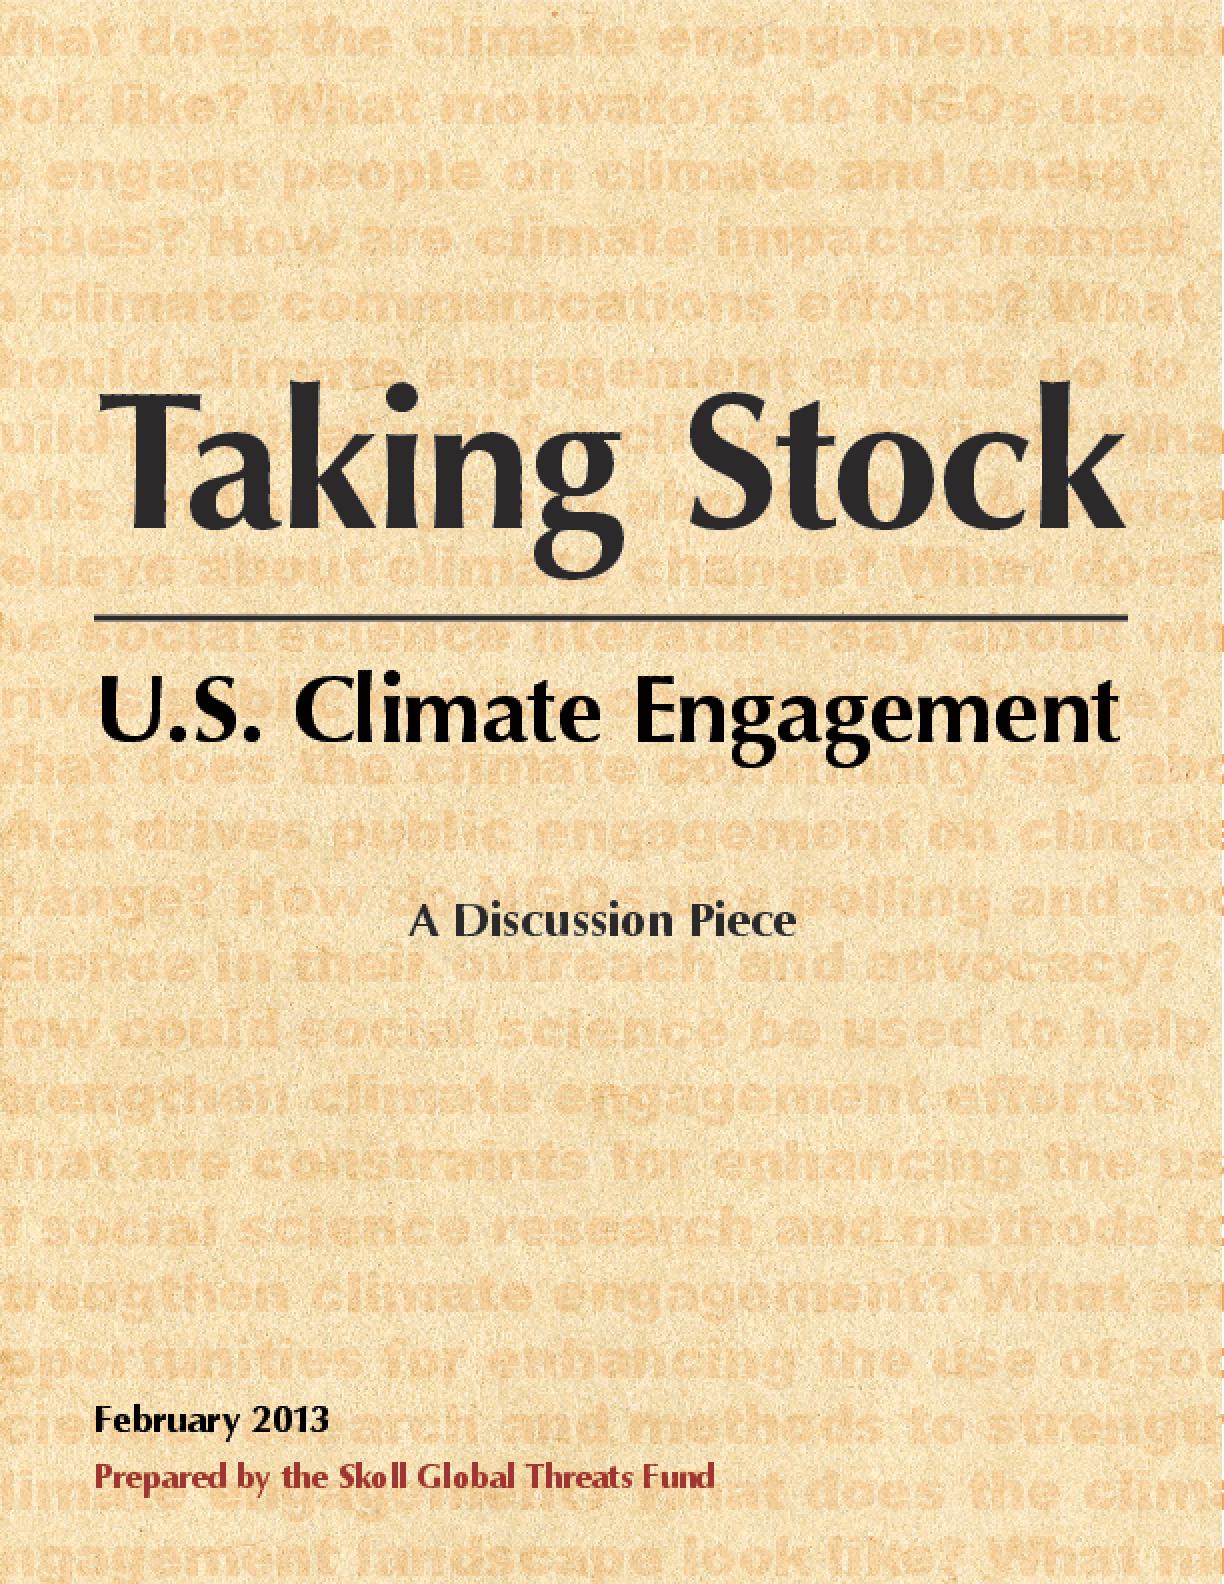 Taking Stock: U.S. Climate Engagement